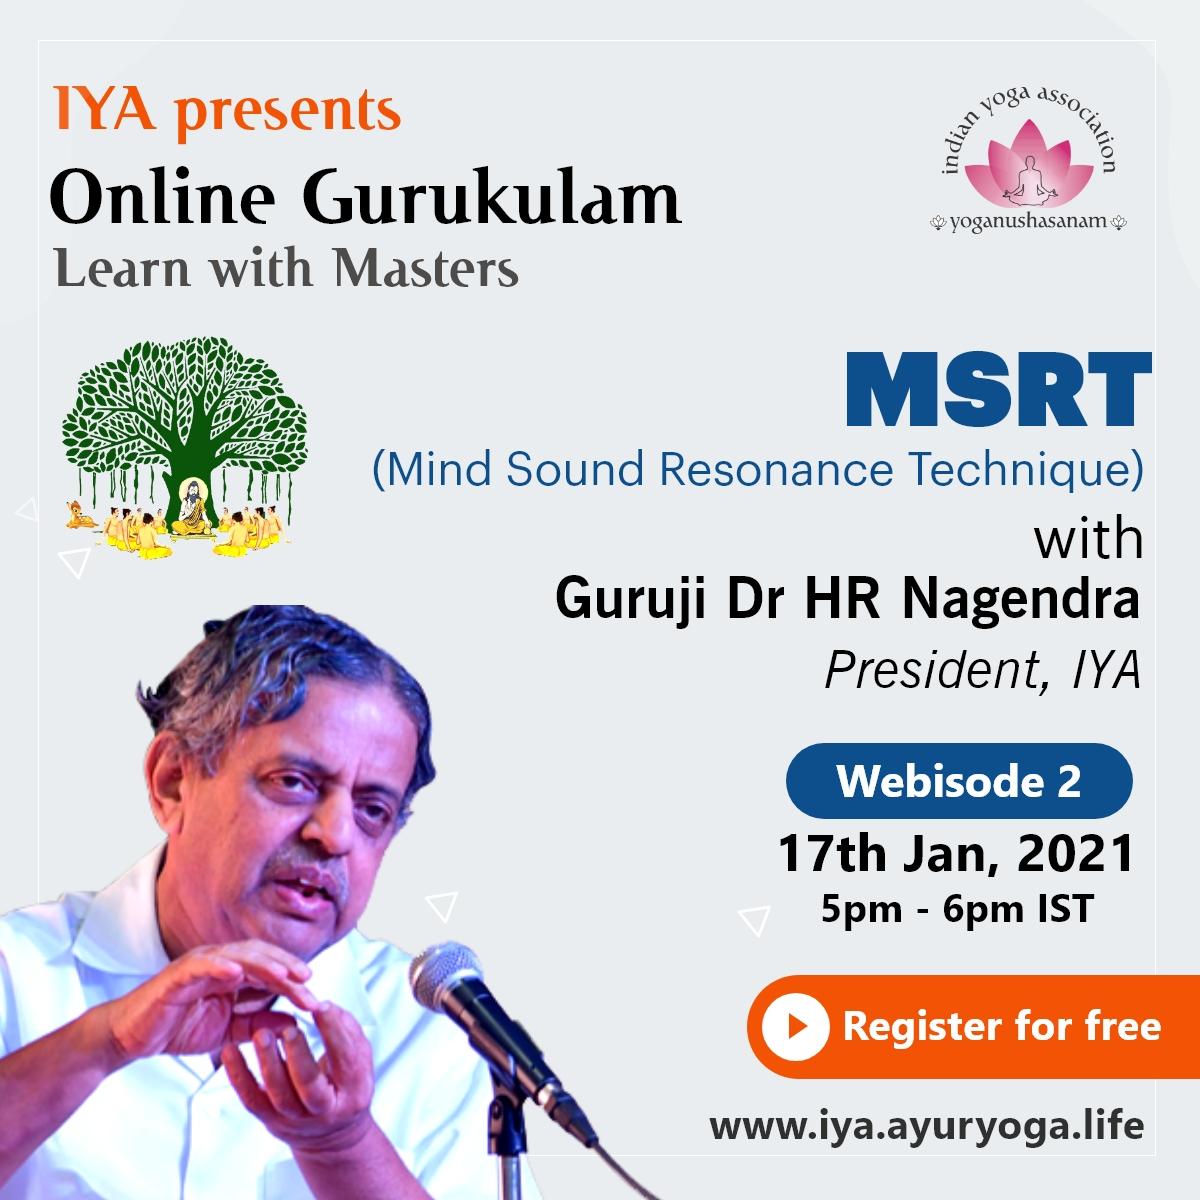 Guruji Dr HR Nagendra ji , President, IYA and Chancellor, SVYASA